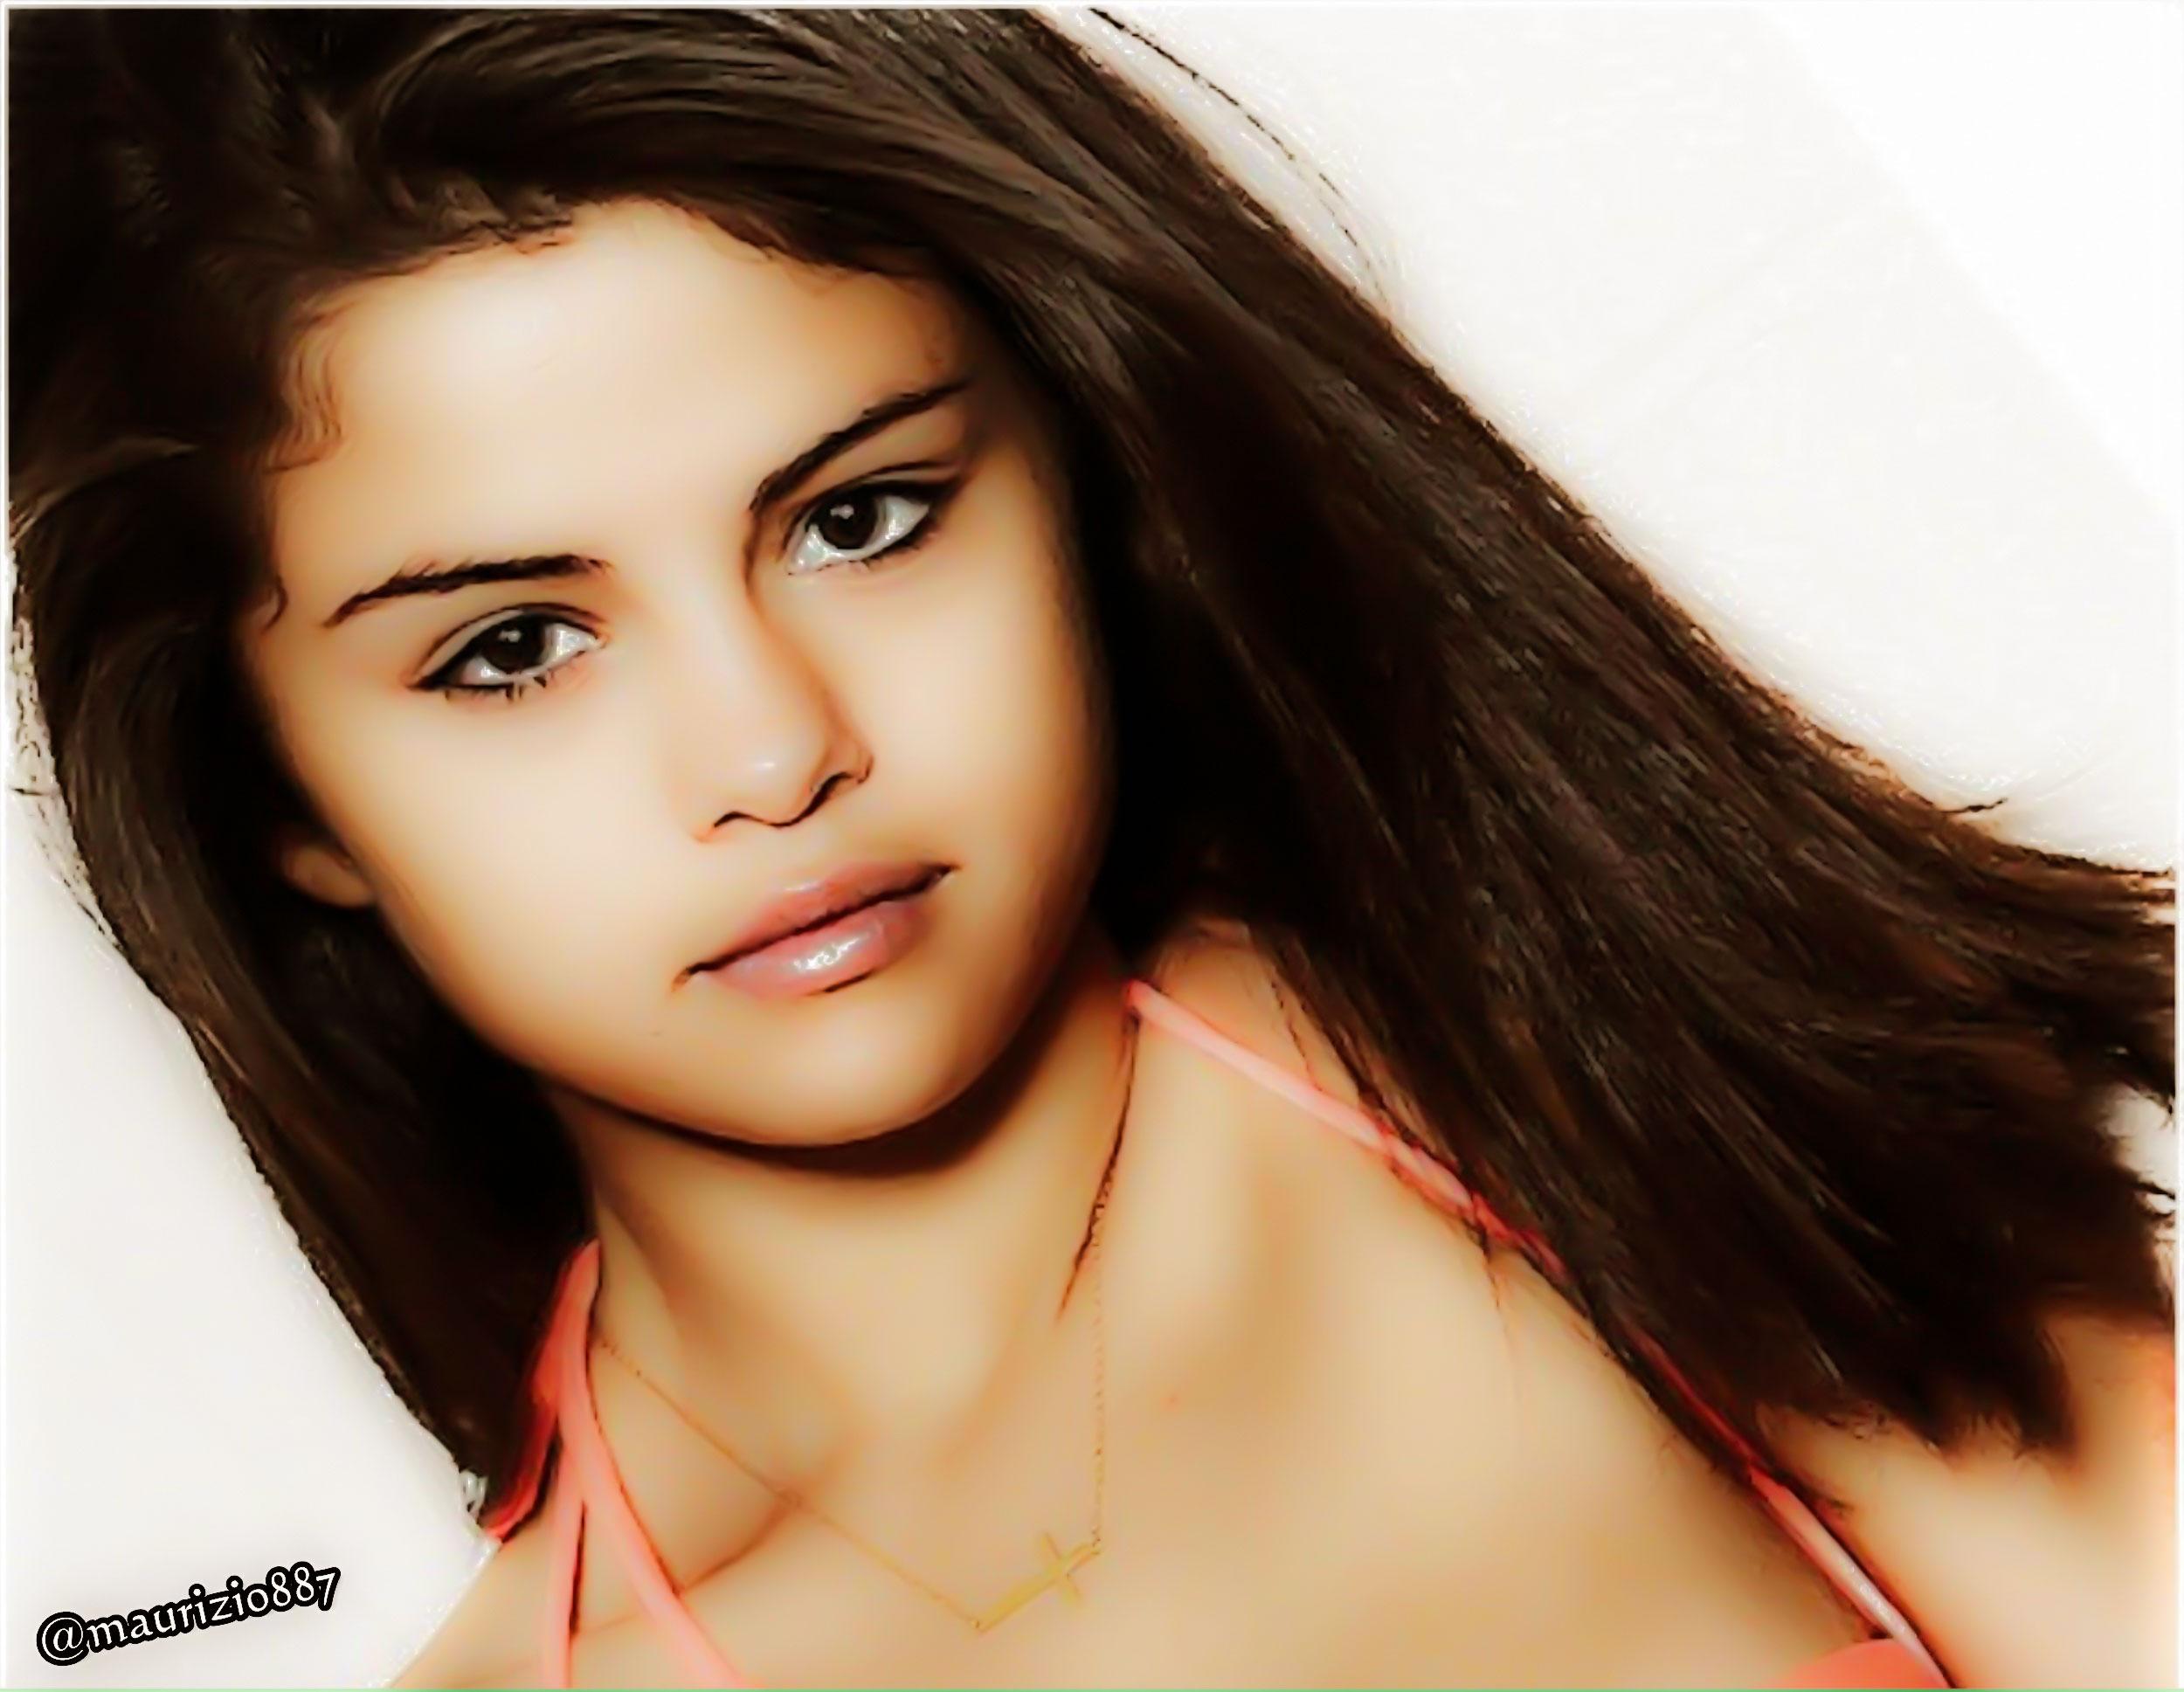 Selena gomez 2014 selena gomez photo 37189199 fanpop - Photo selena gomez 2014 ...